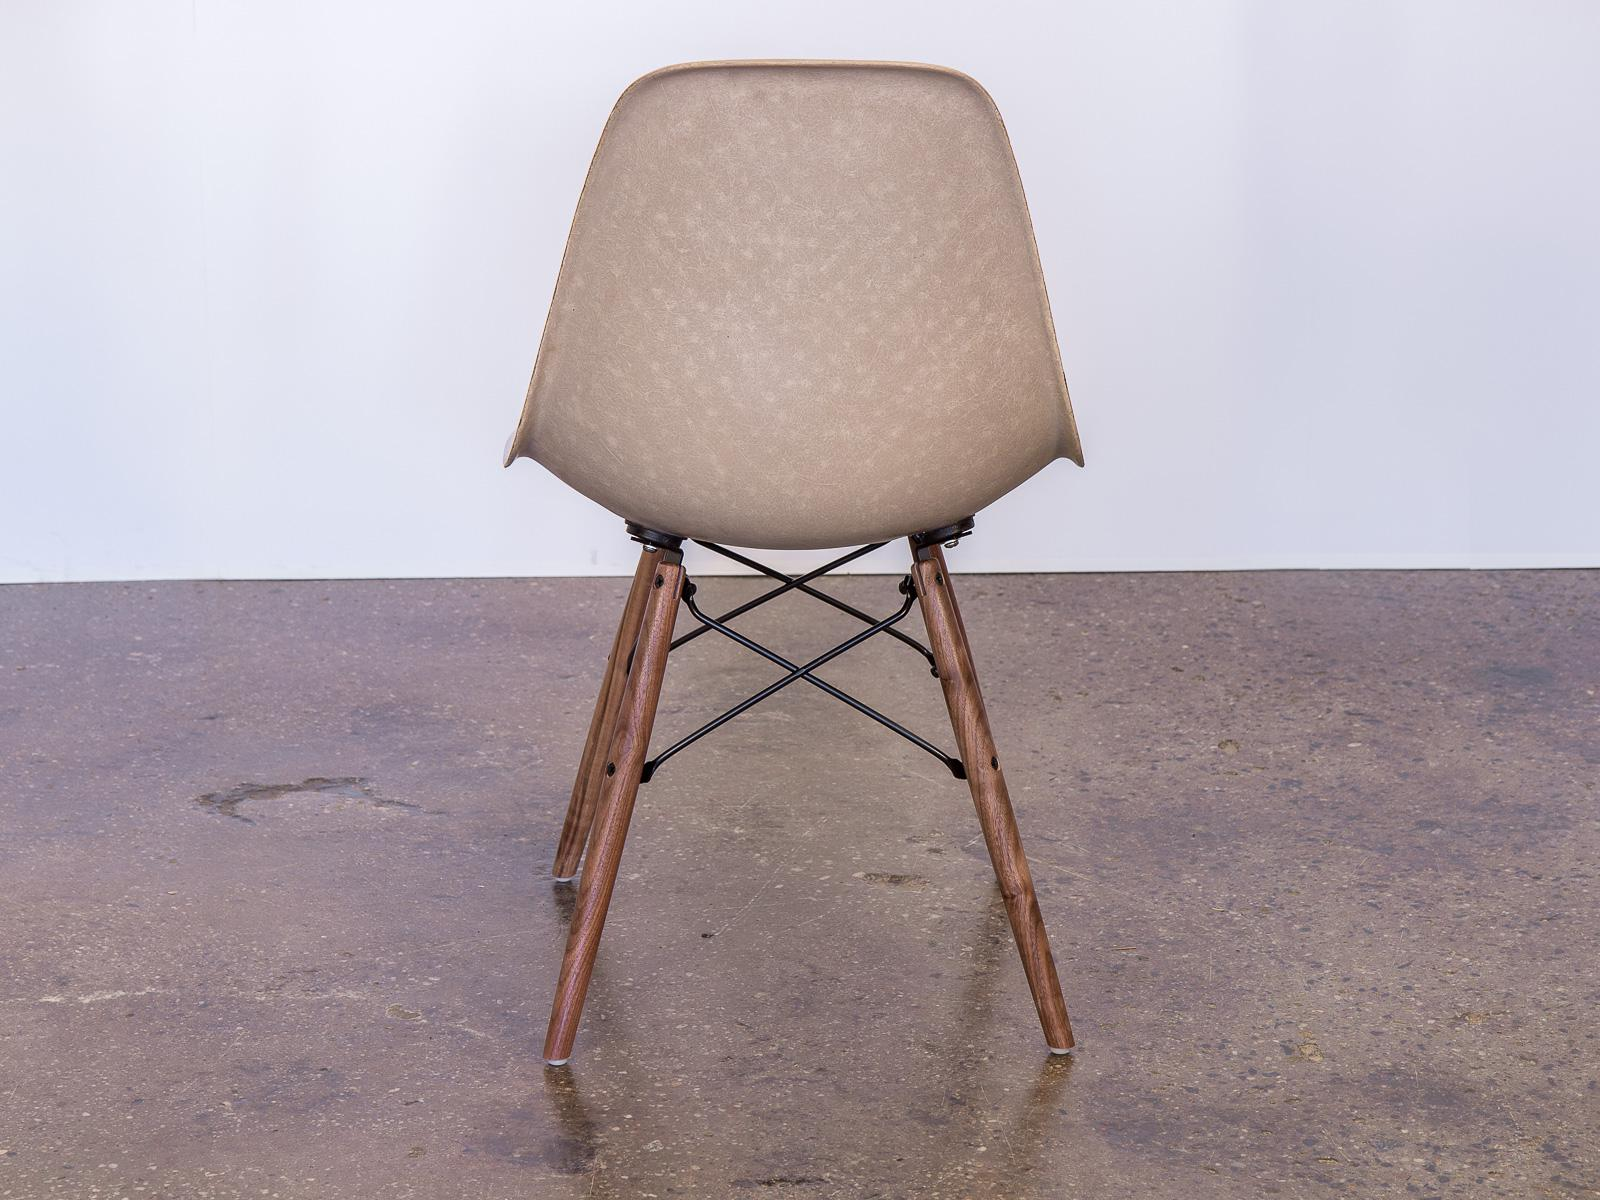 Herman Miller Eames Fiberglass Greige Shell Chairs On Walnut Dowel Base For  Sale   Image 4